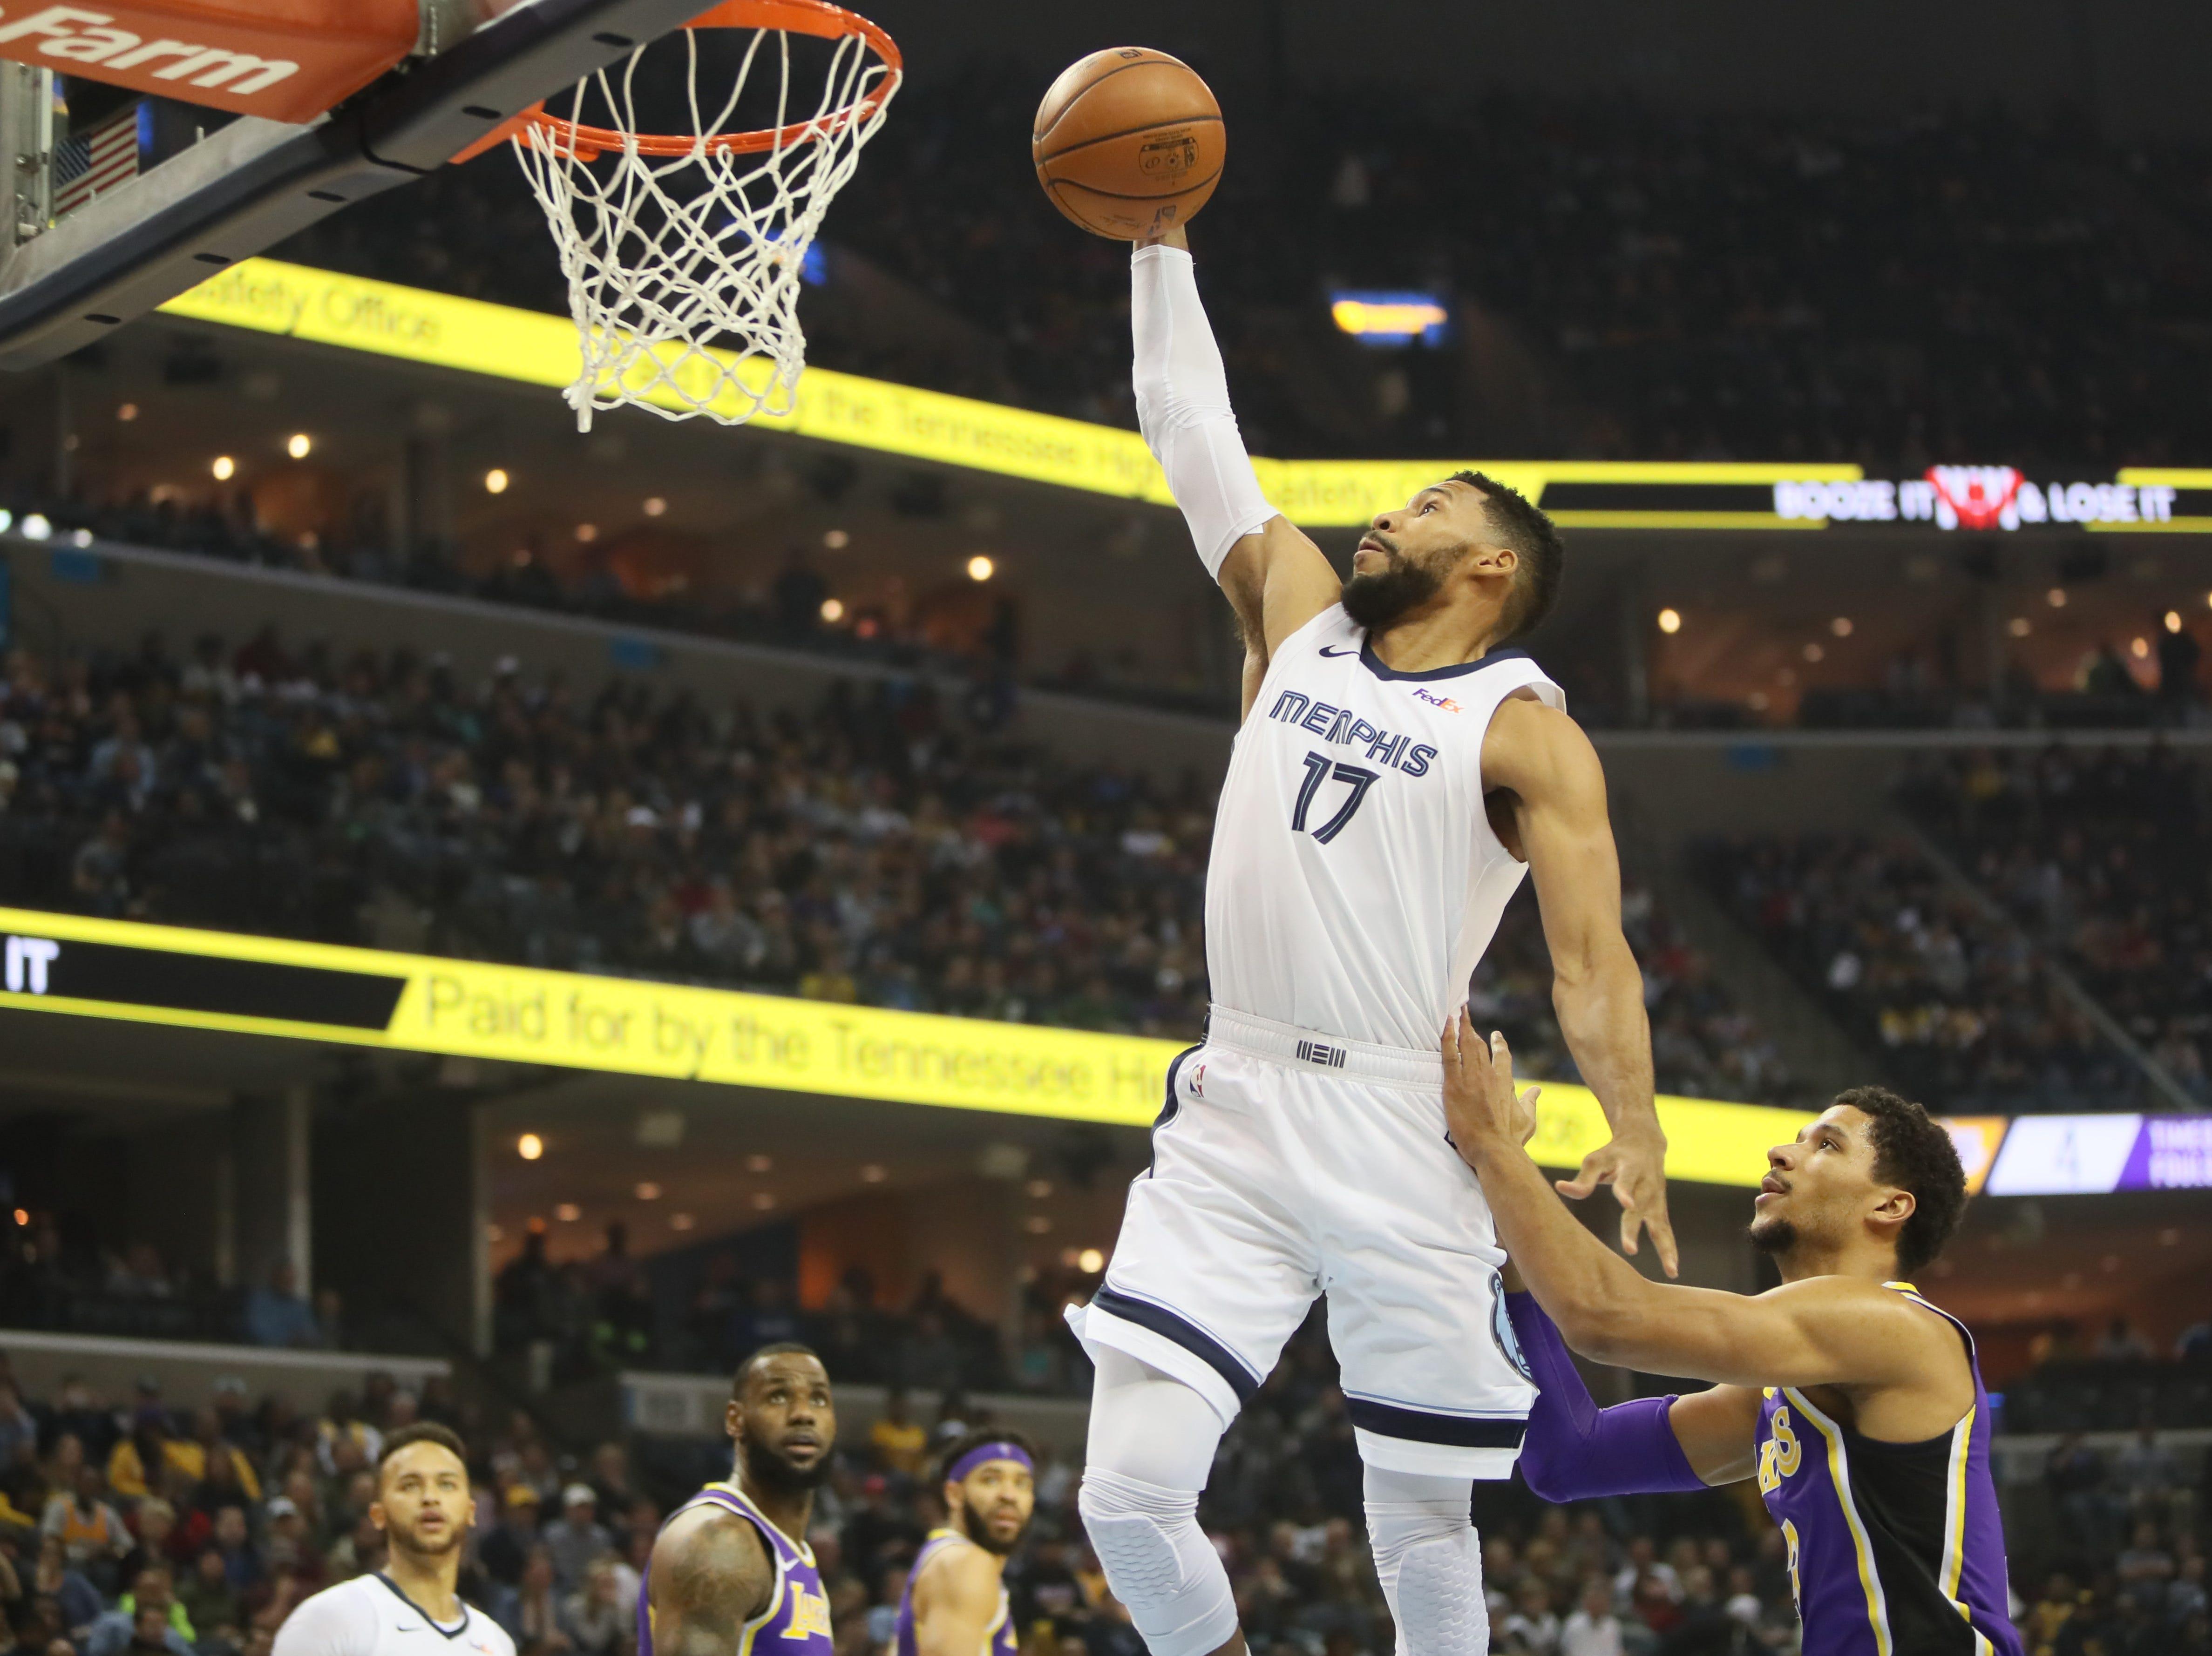 Memphis Grizzlies guard Garrett Temple dunks the ball past Los Angeles Lakers defender Josh Hart at the FedExForum on Saturday, Dec. 6, 2018.